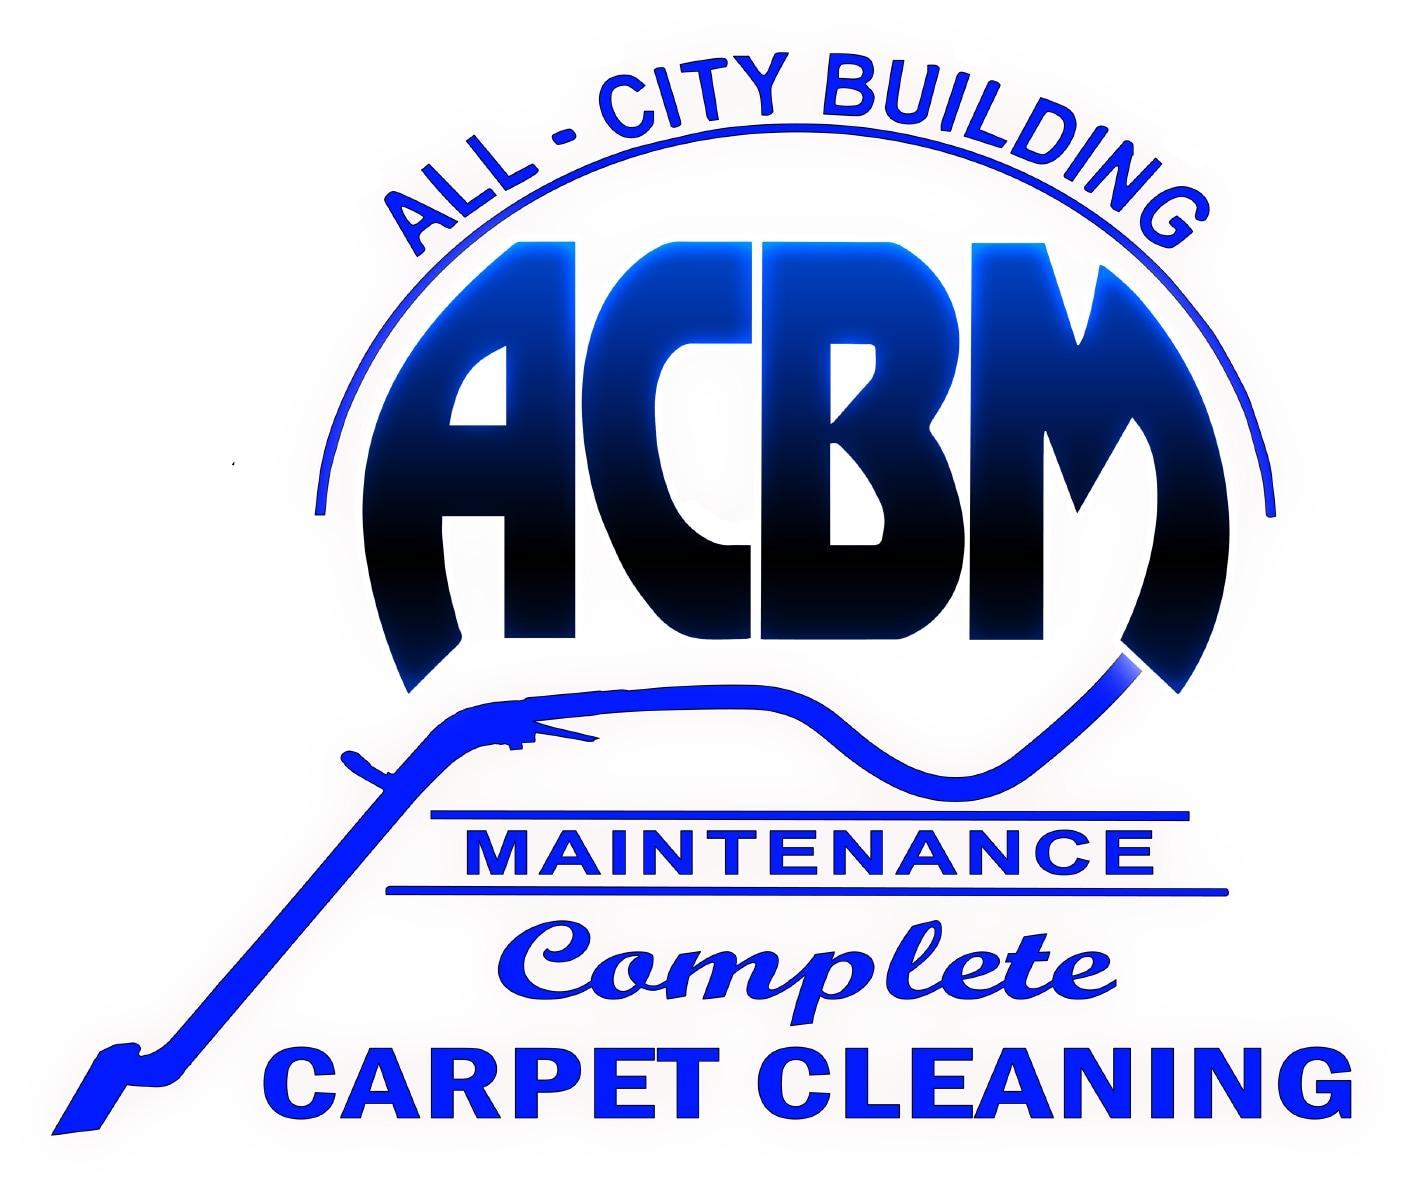 All City Building Maintenance